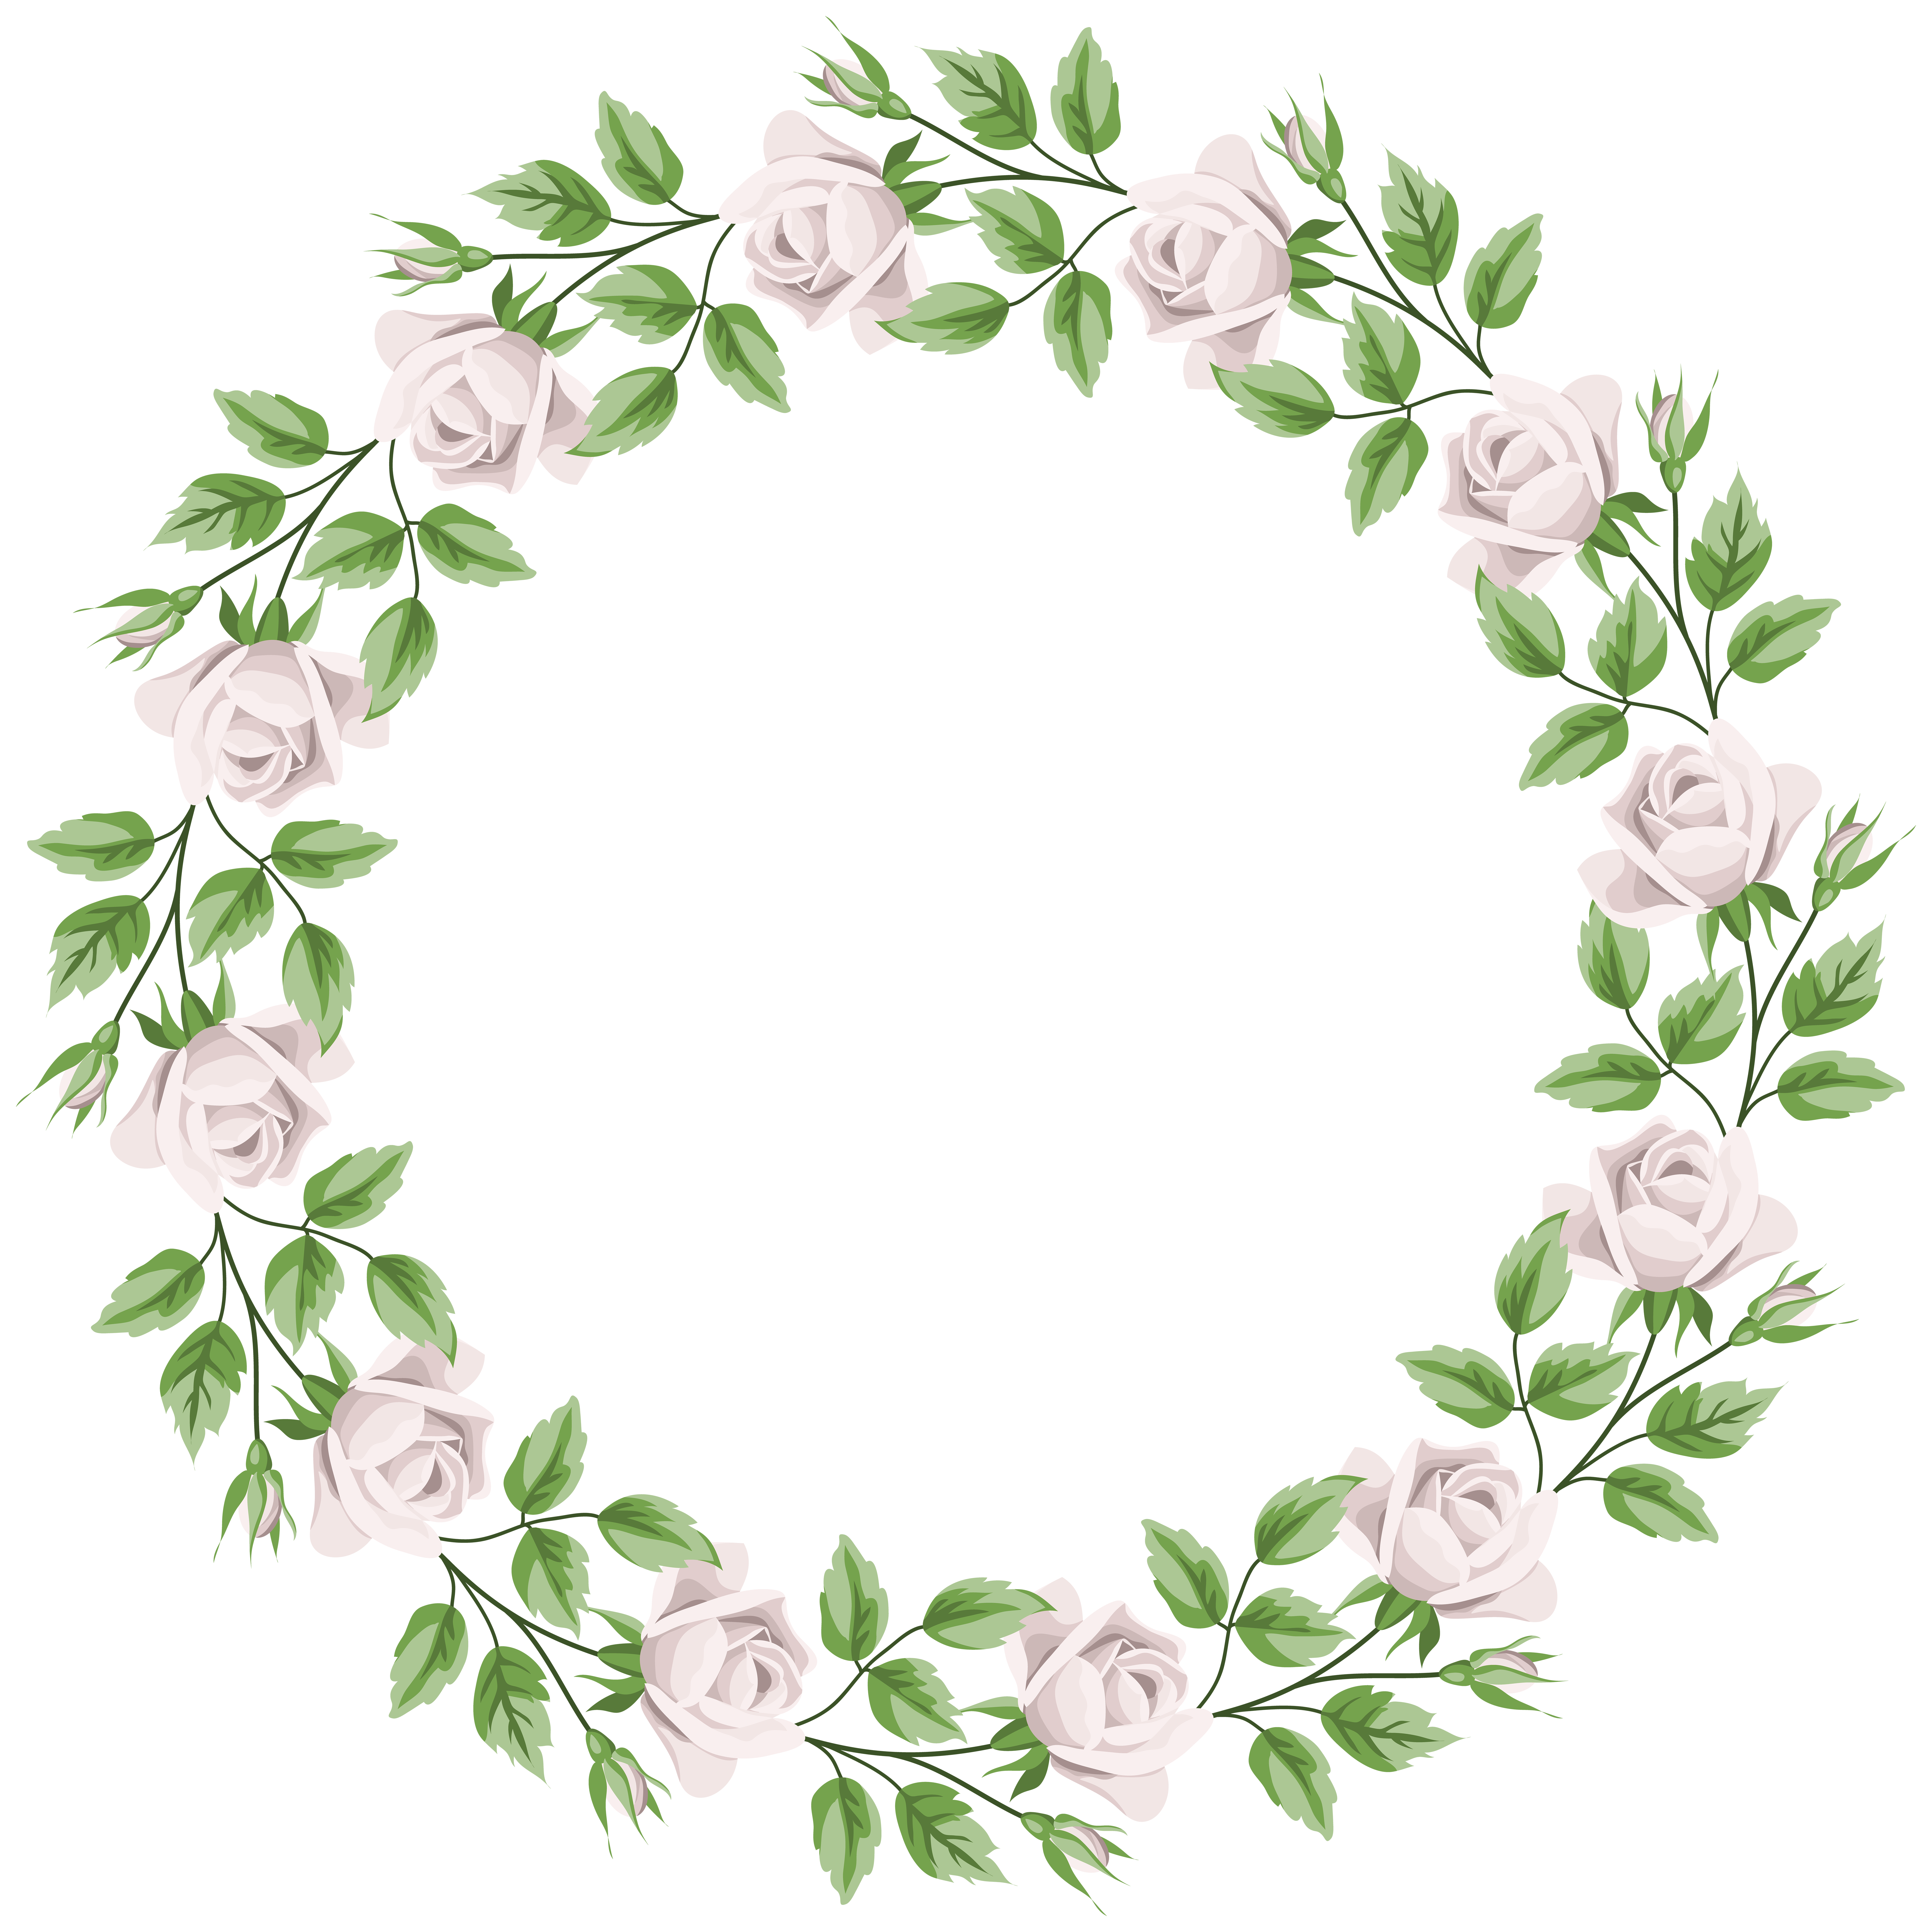 White Rose Border Frame Transparent PNG Clip Art.